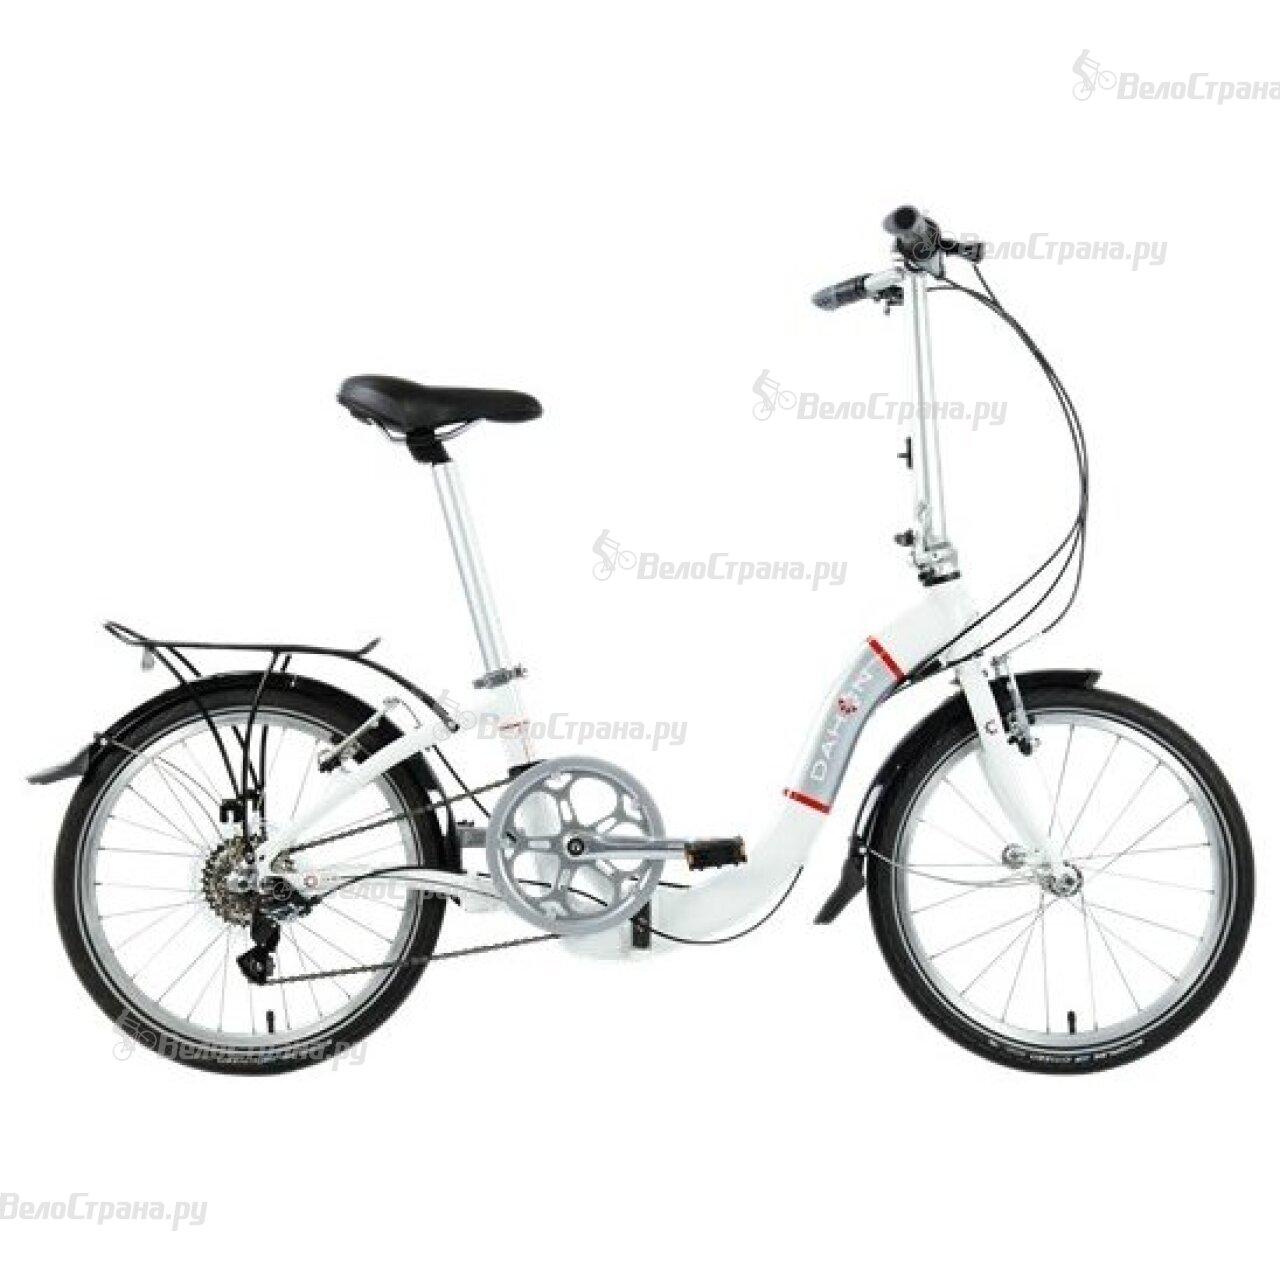 Велосипед Dahon Ciao D7 (2017) велосипед dahon speed d7 2014